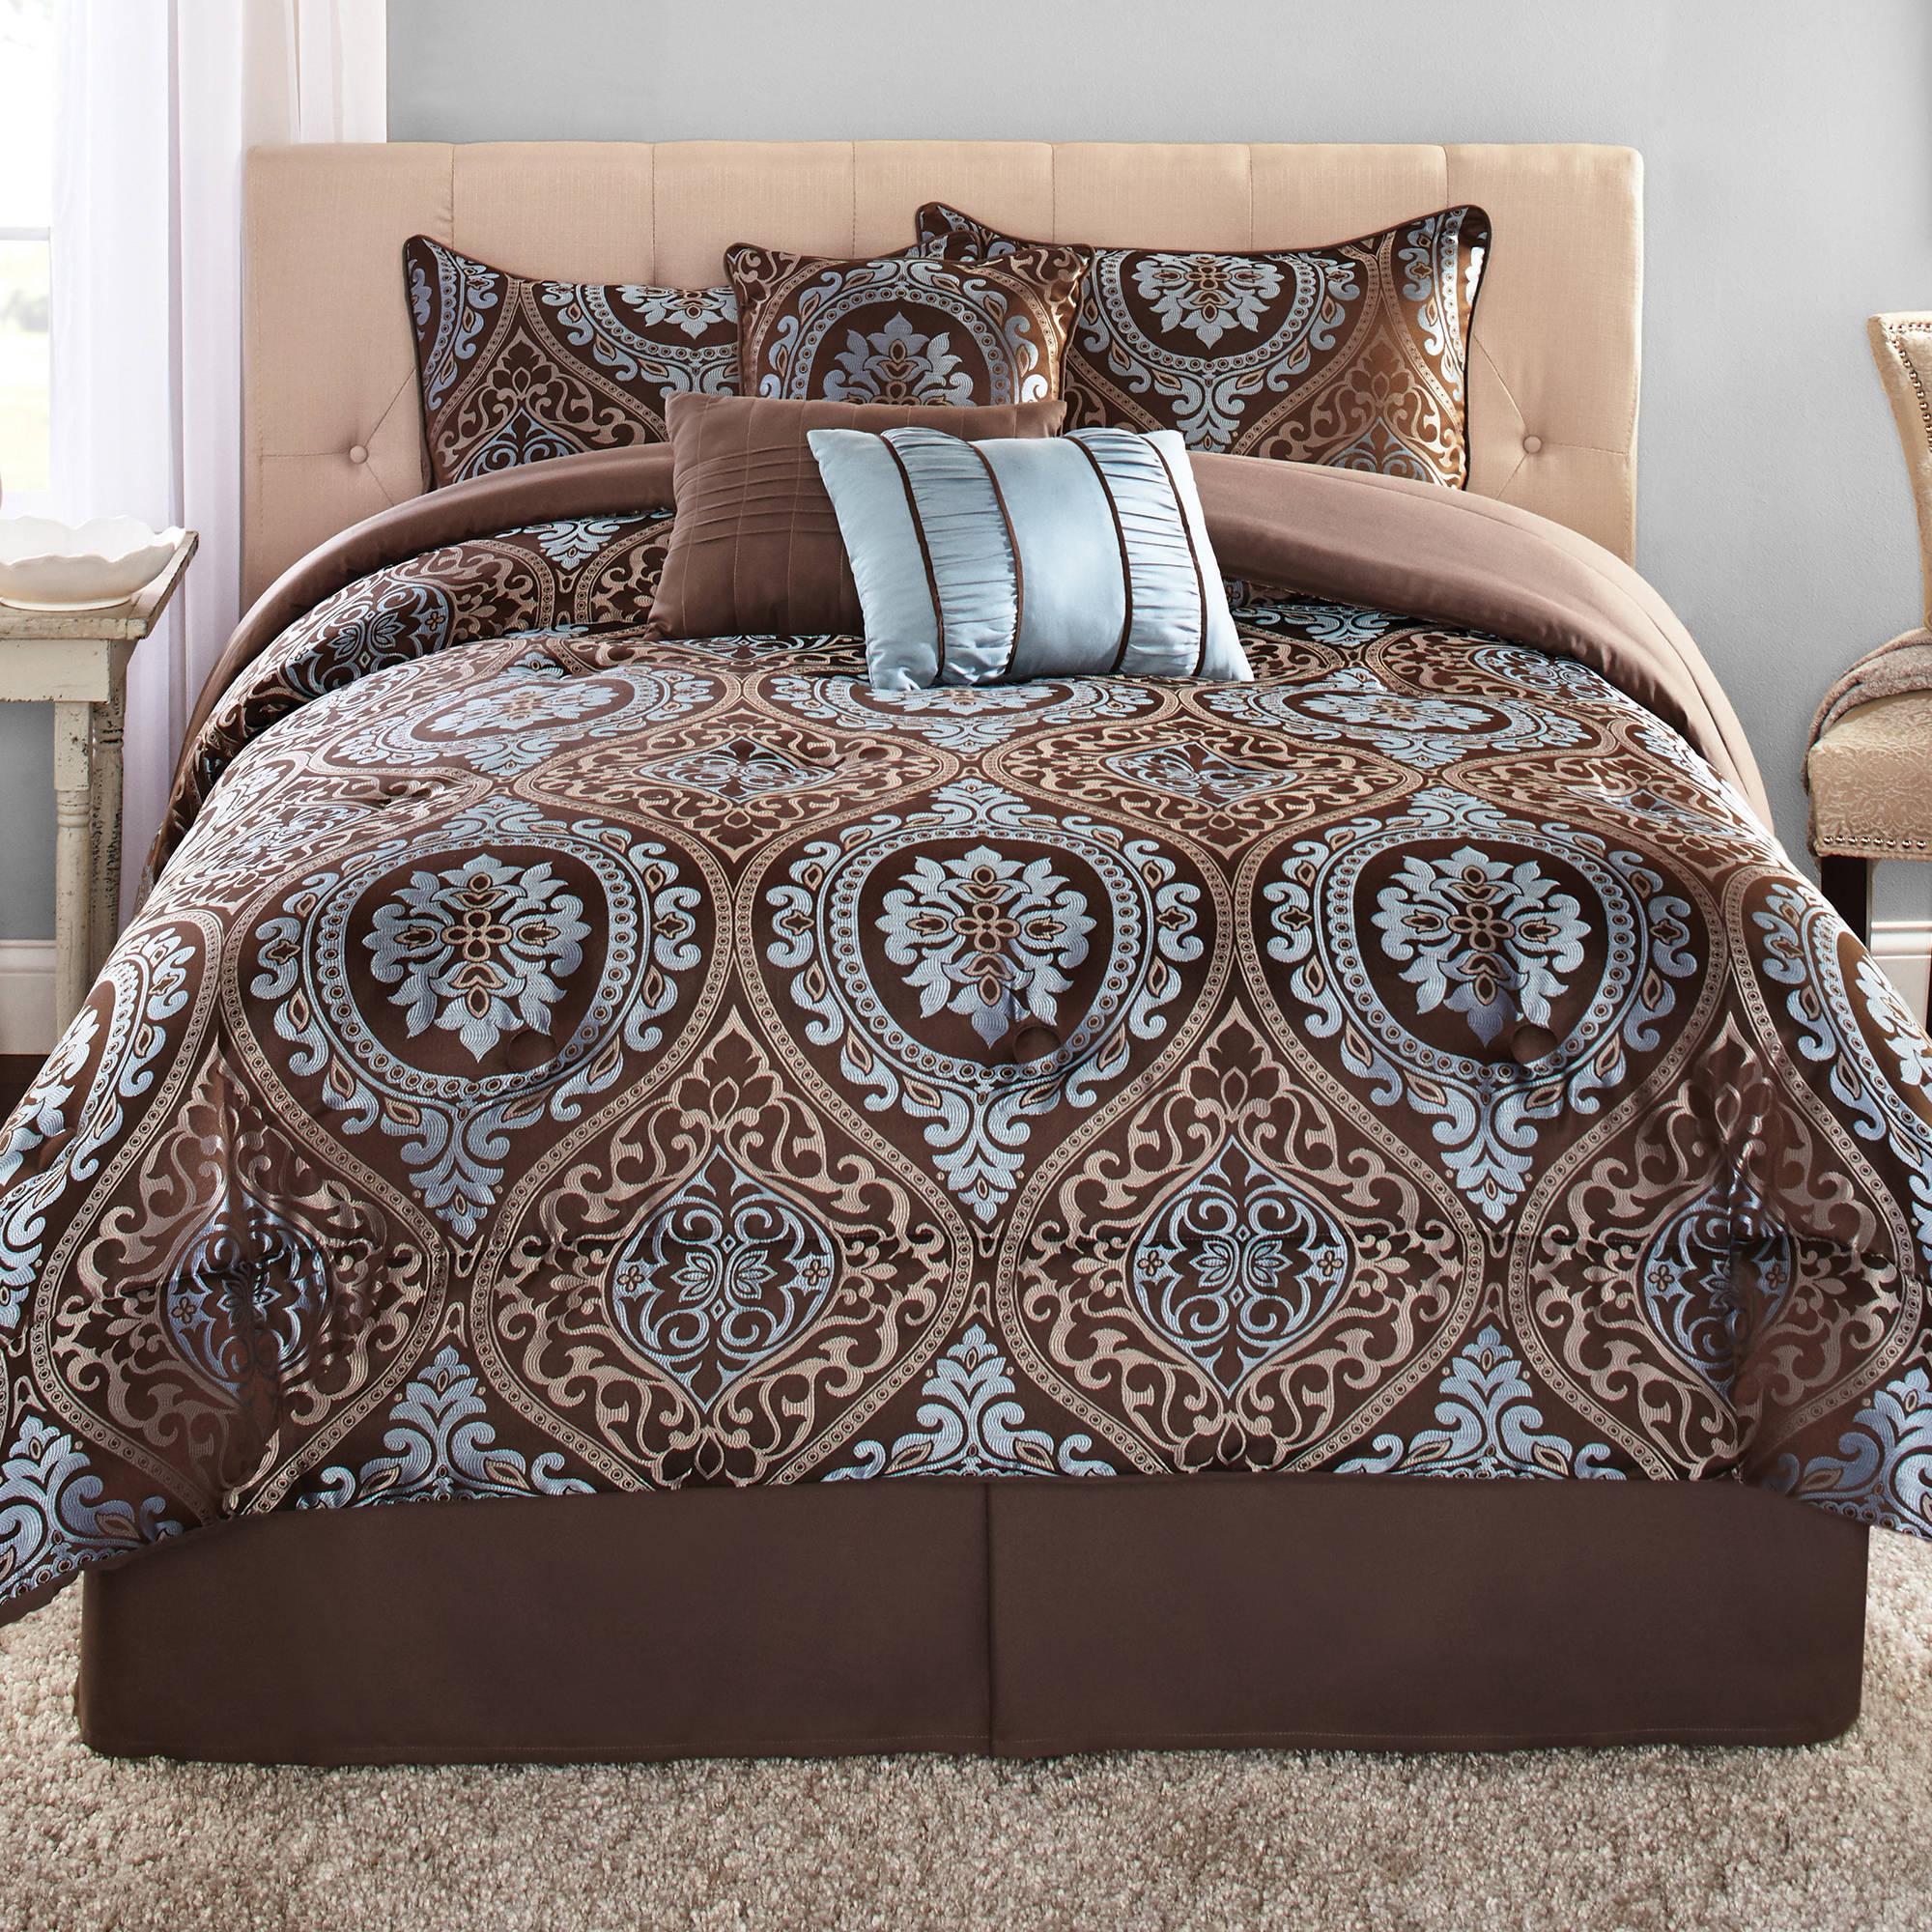 Mainstays Full or Queen Victoria Jacquard Comforter Set, 7 Piece